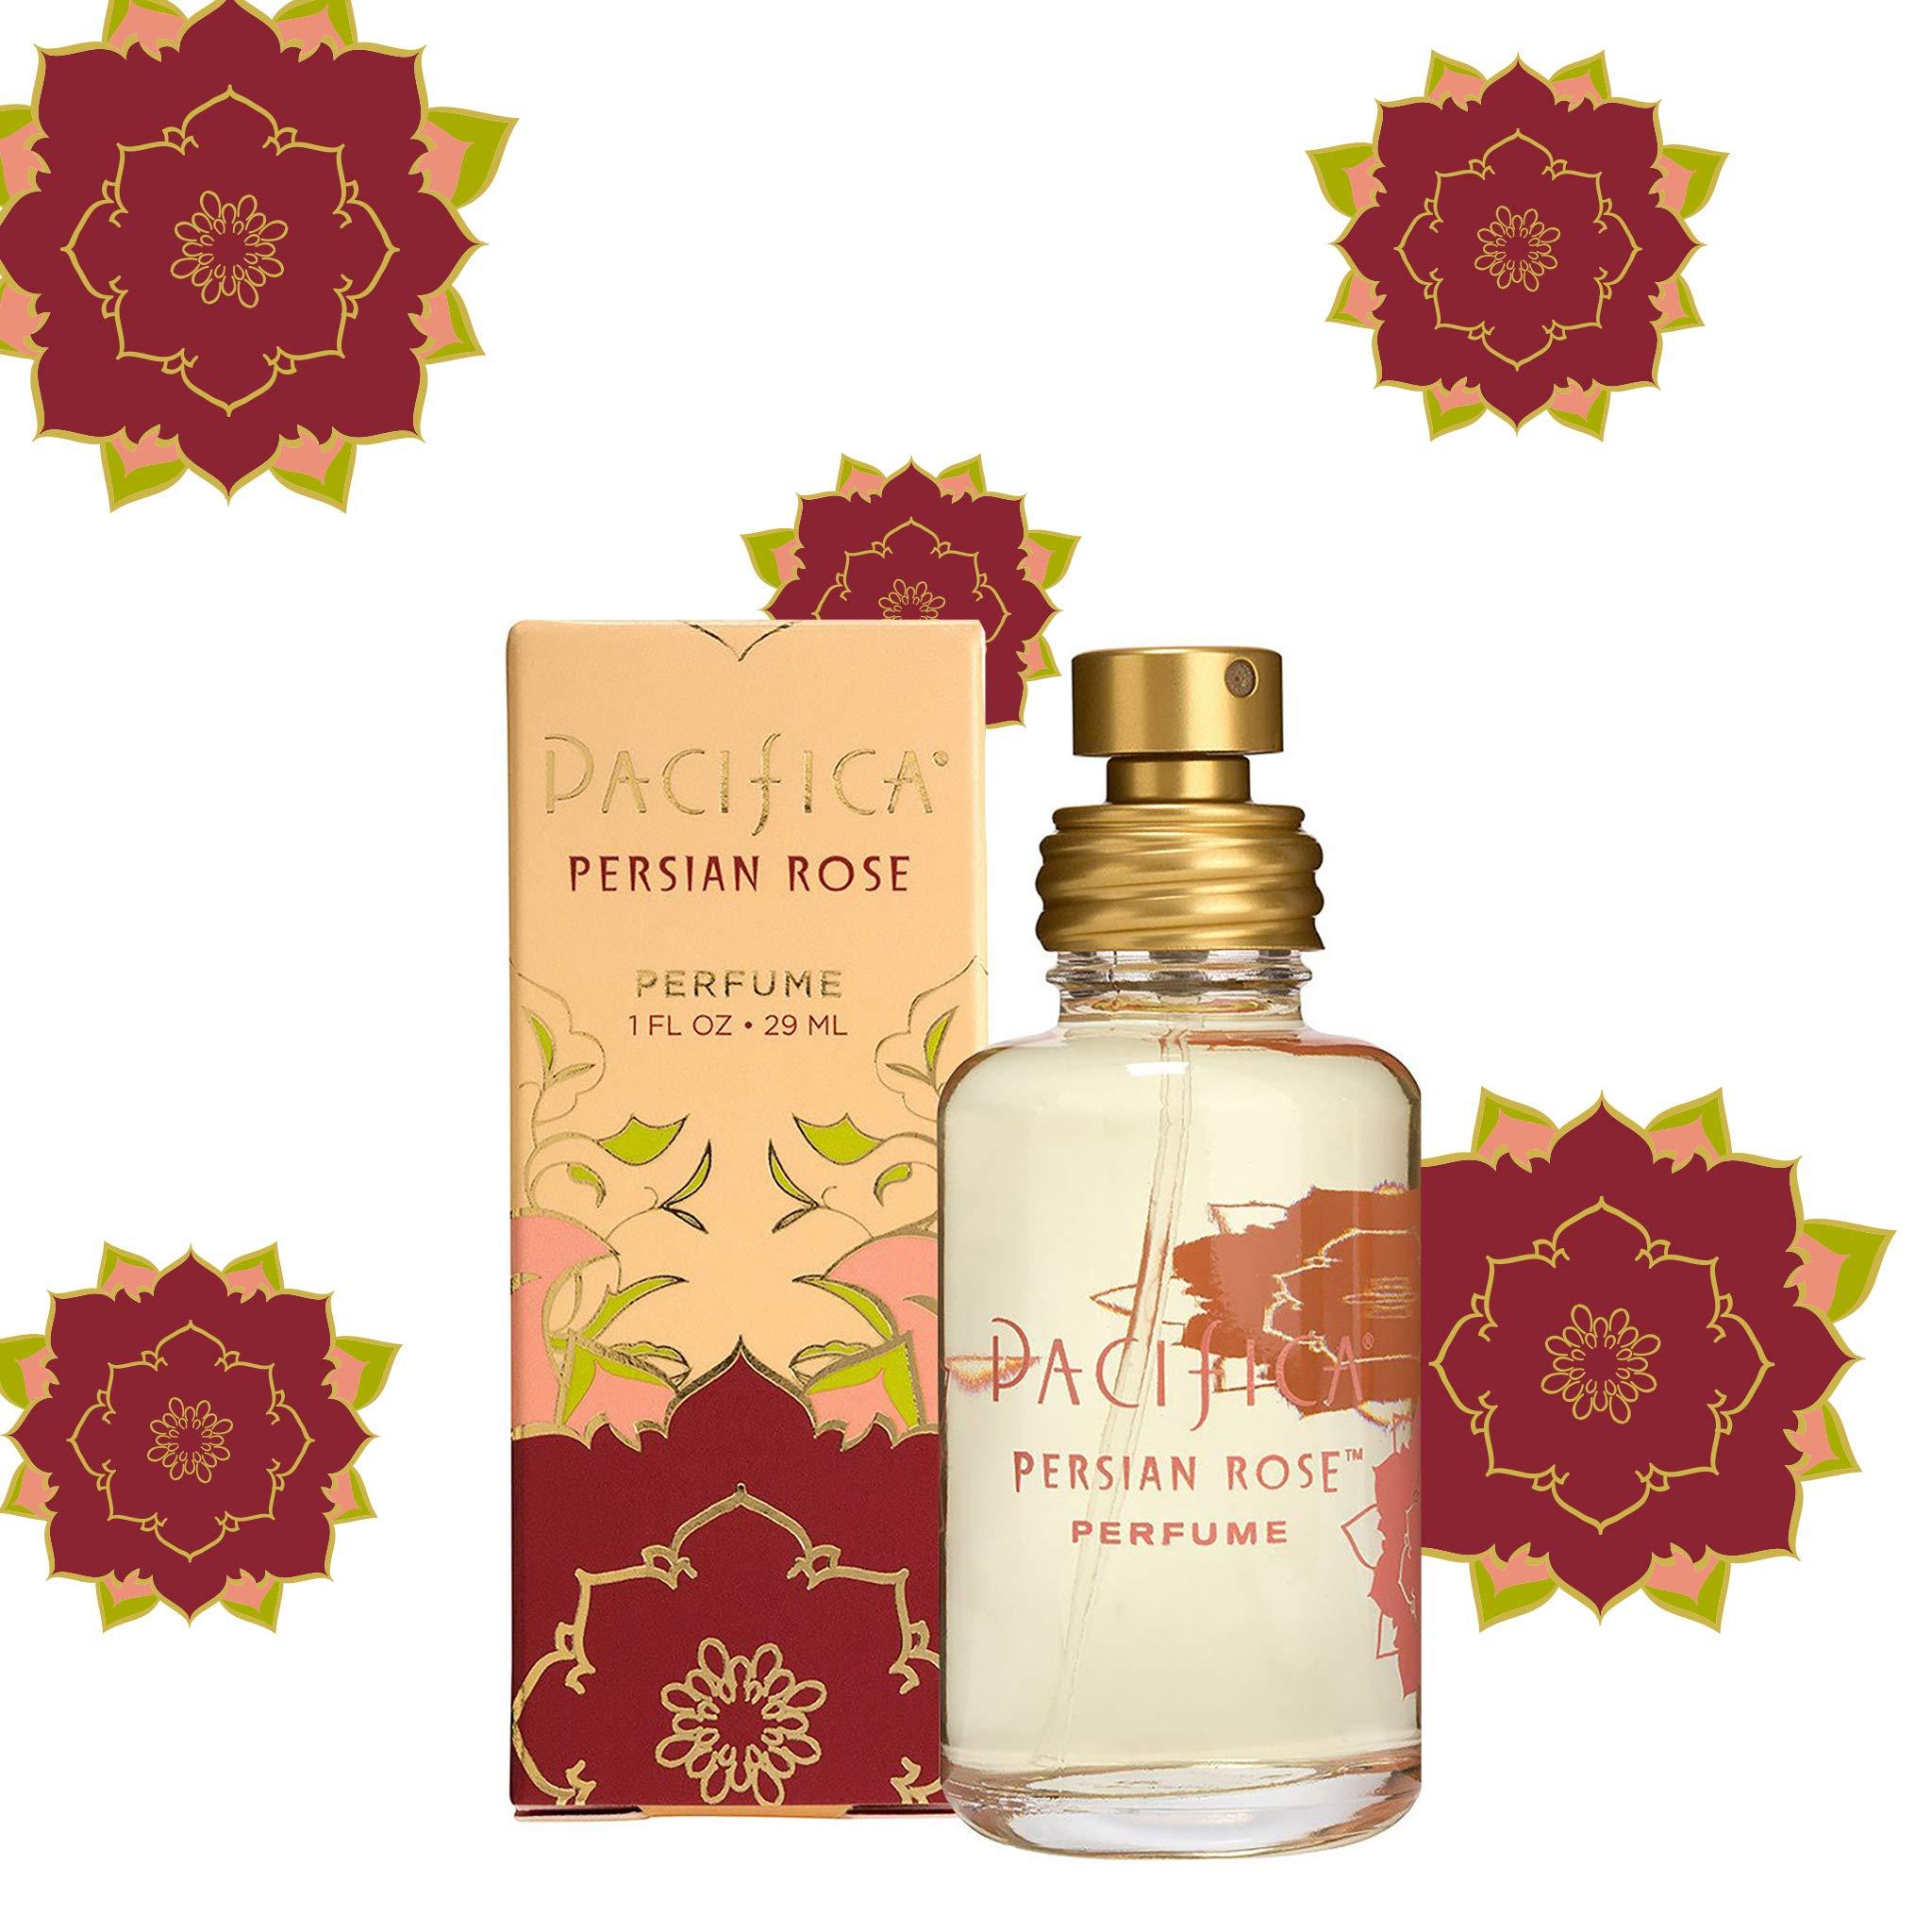 Pacifica Beauty Spray Perfume, Persian Rose, 1 Fluid Ounce